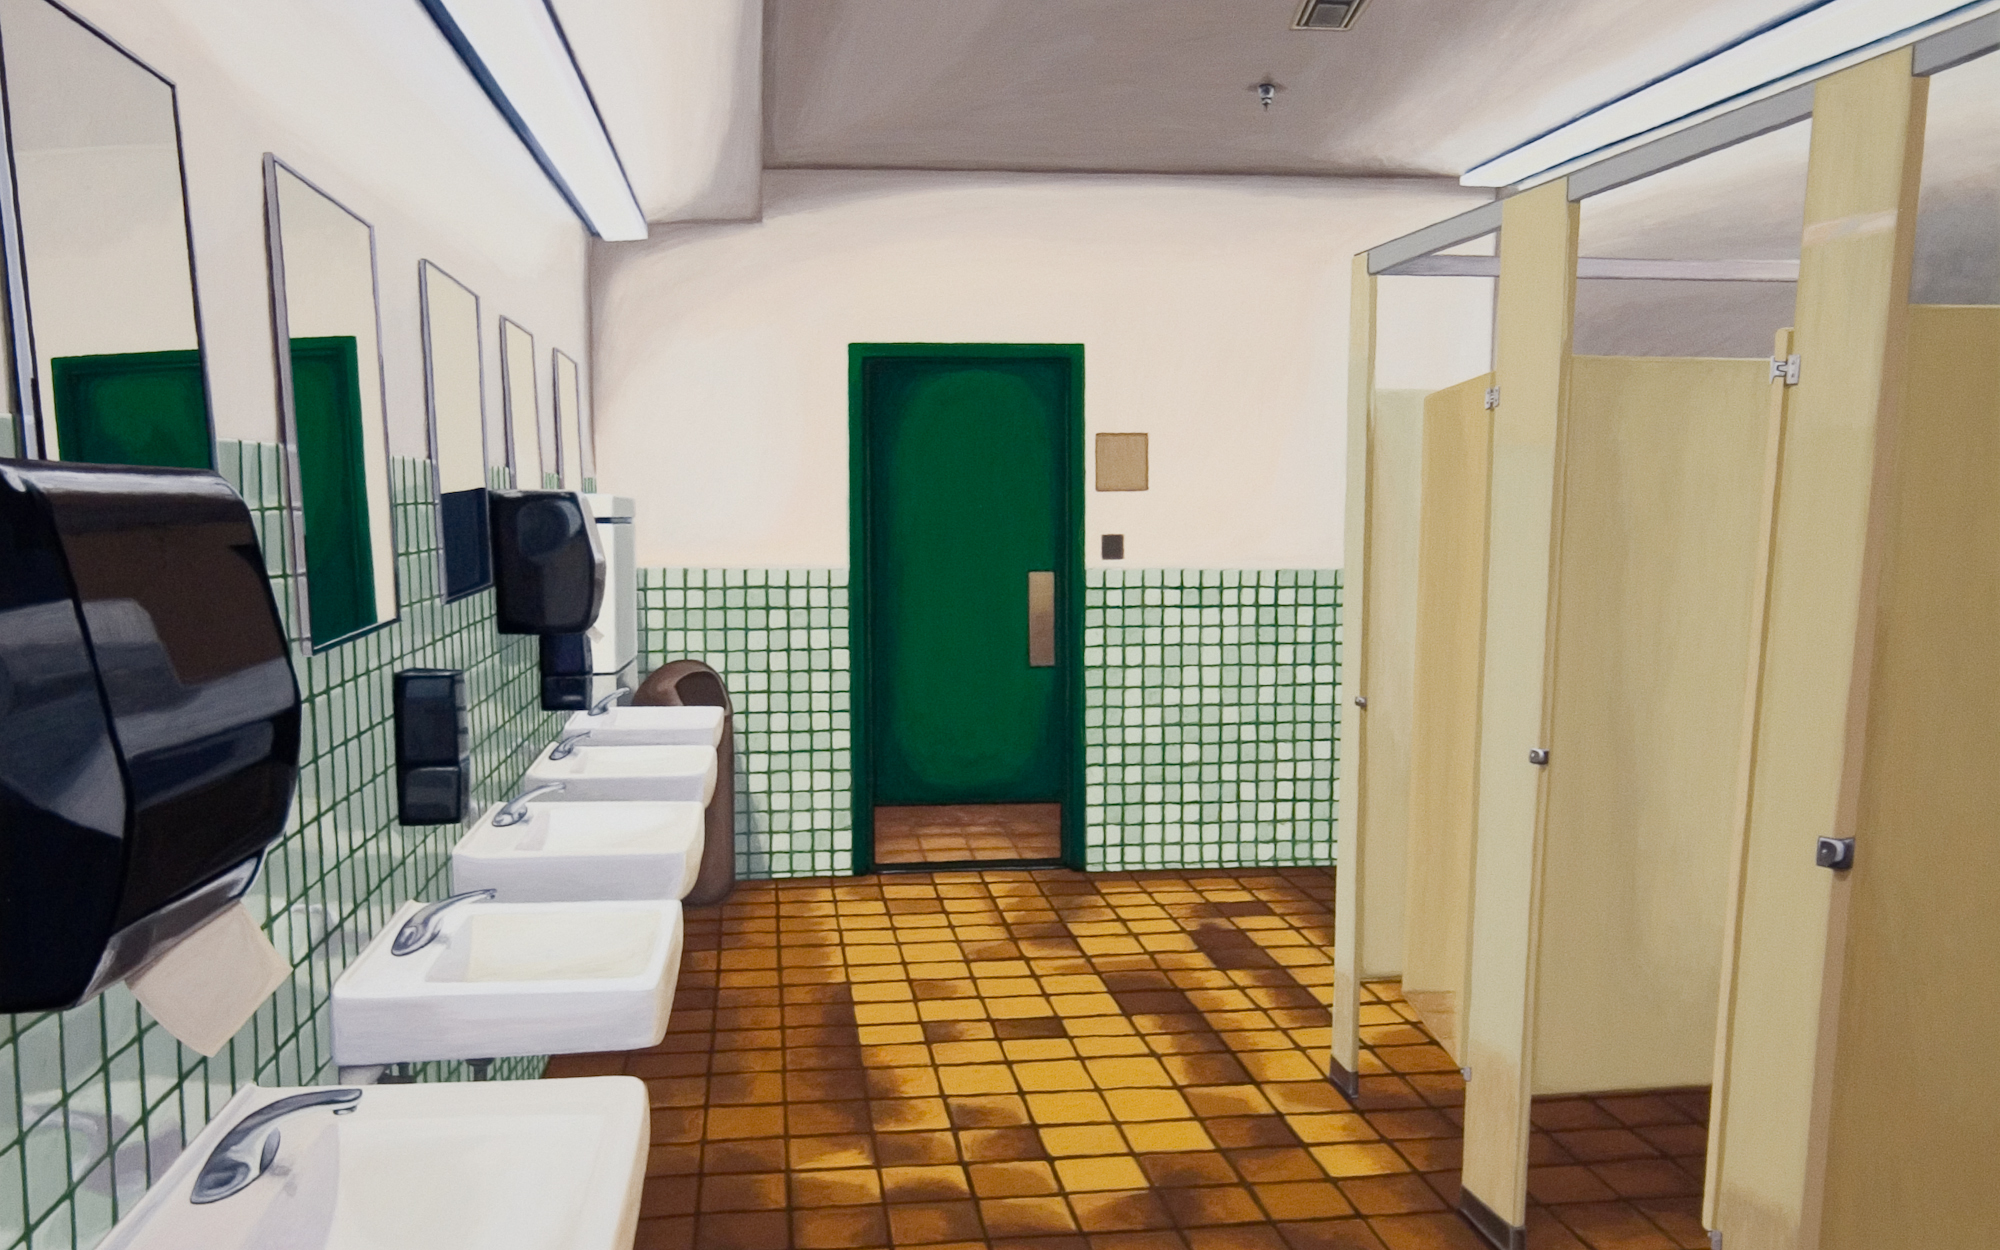 Bathroom #2, 2005, Gouache on Paper, 15 X 22 inches